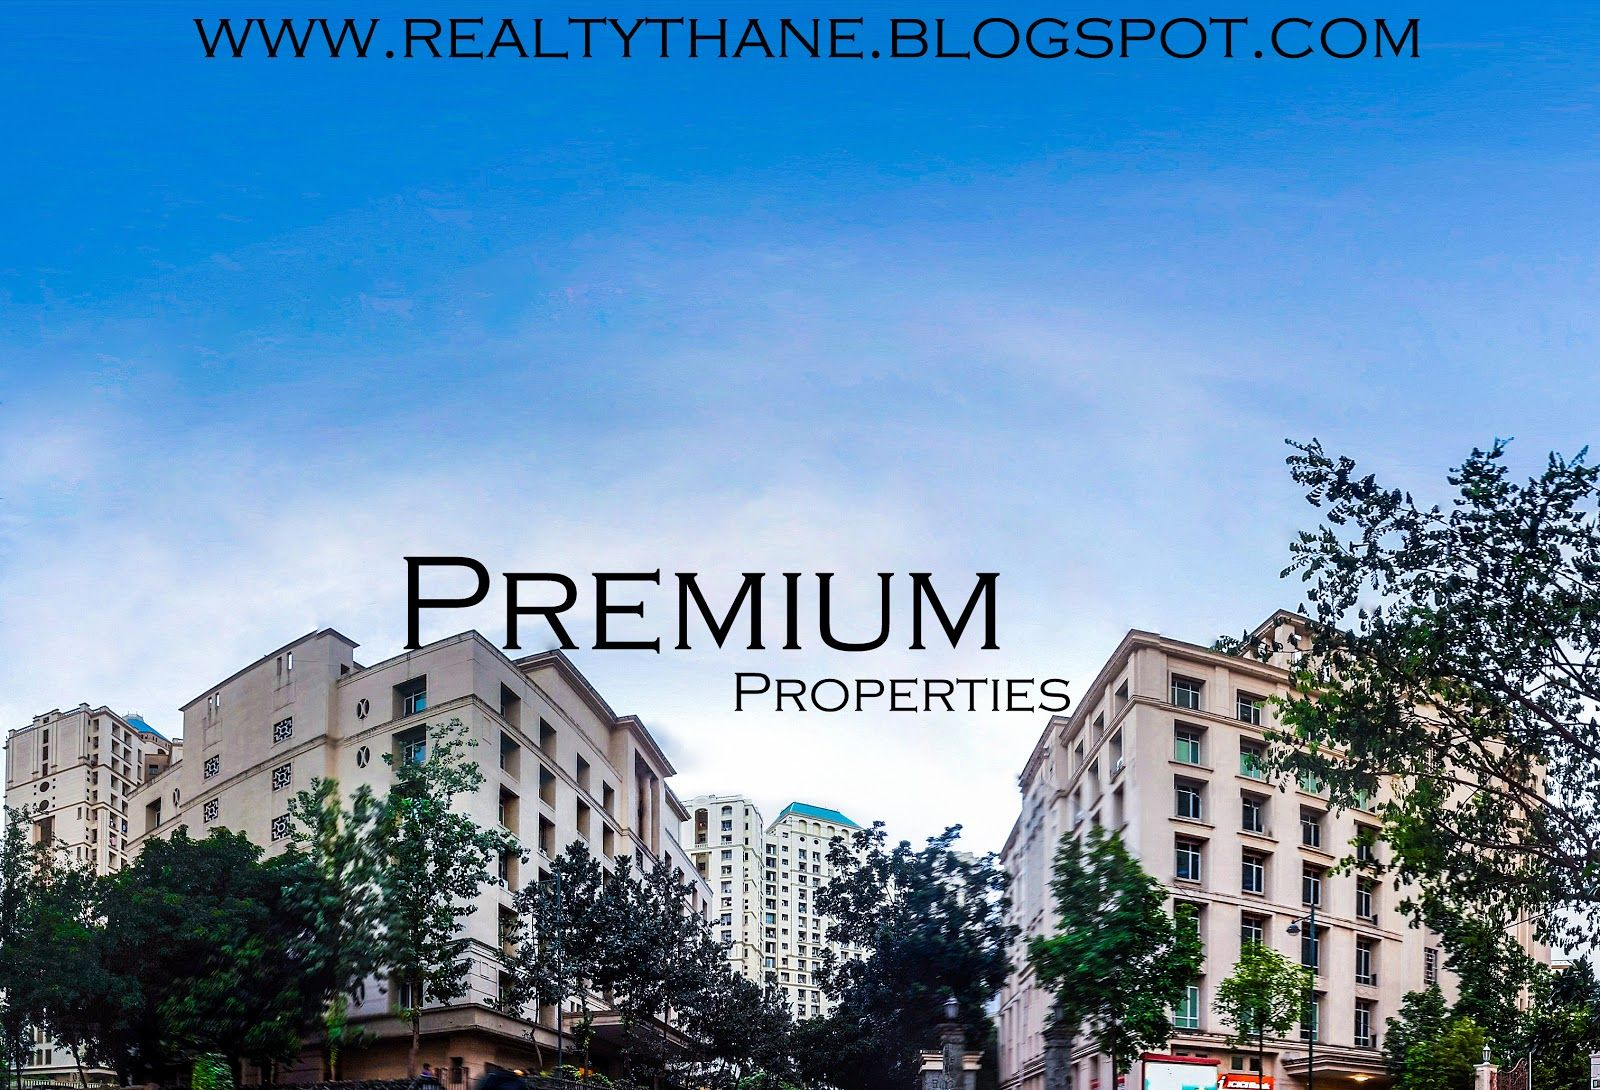 Hiranandani Estate and Hiranandani Meadows properties, flats, apartments, in Thane. buy sell rent sale.